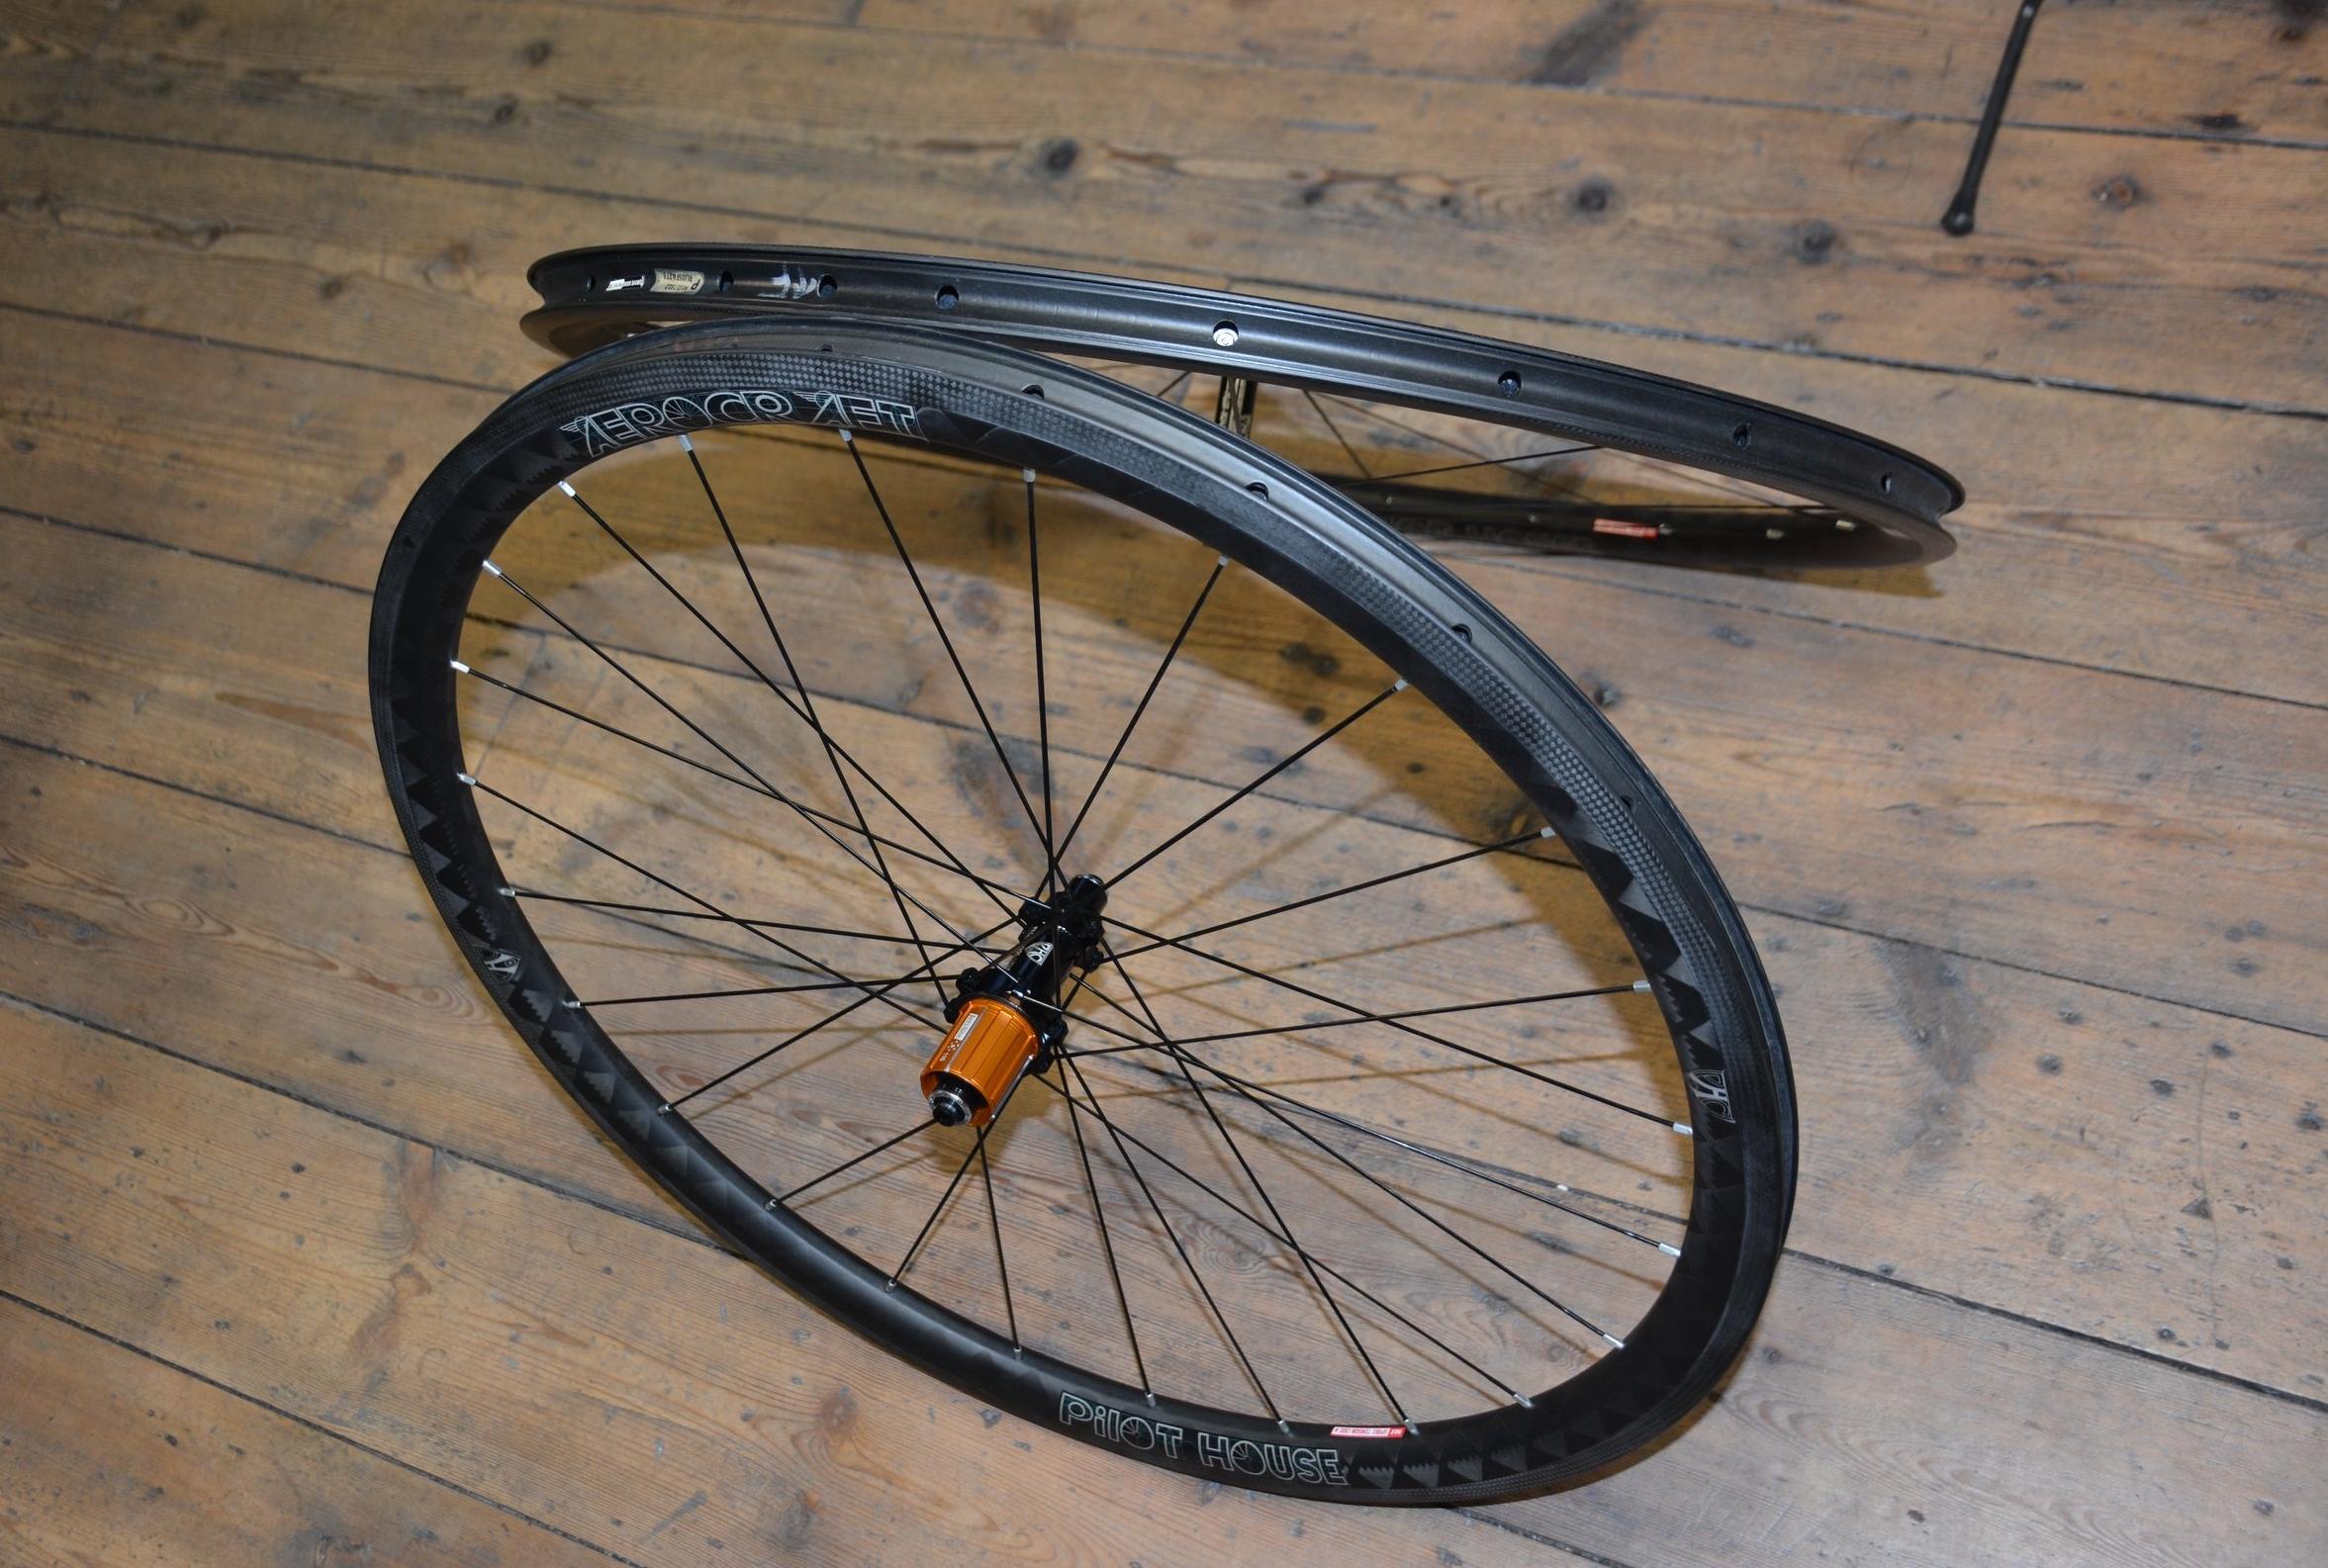 PHC carbon wheels